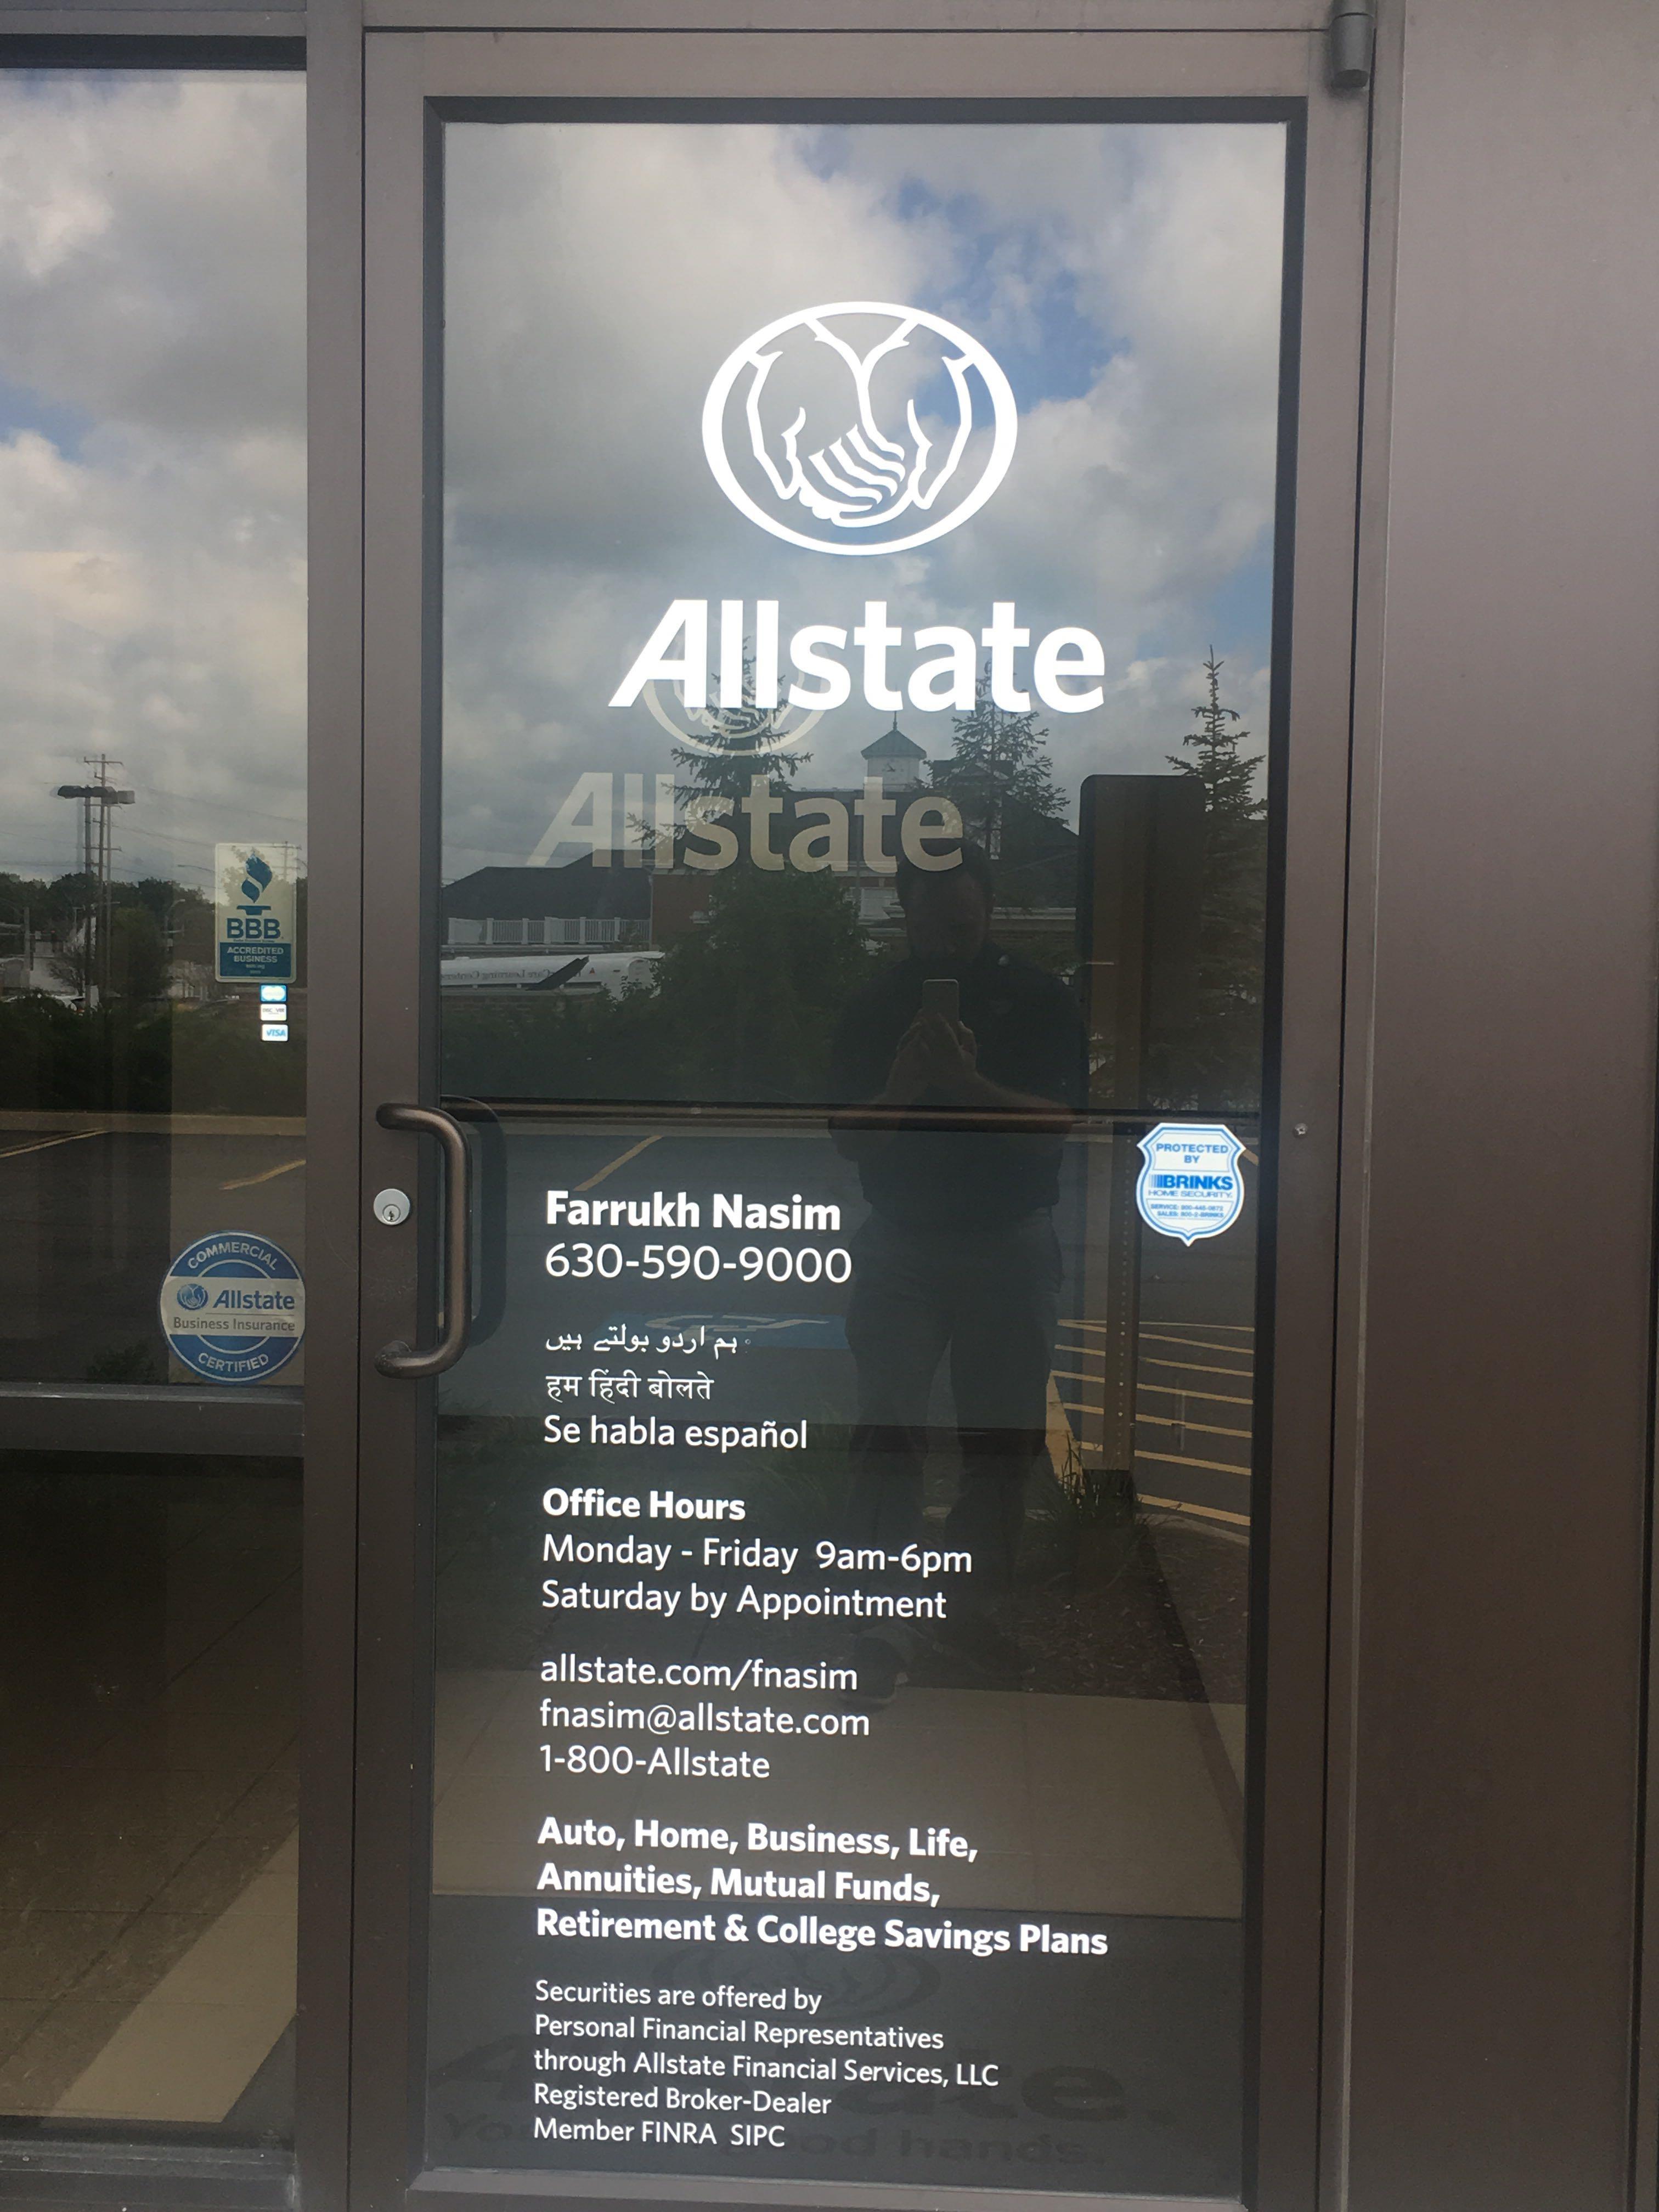 Farrukh Nasim: Allstate Insurance image 1